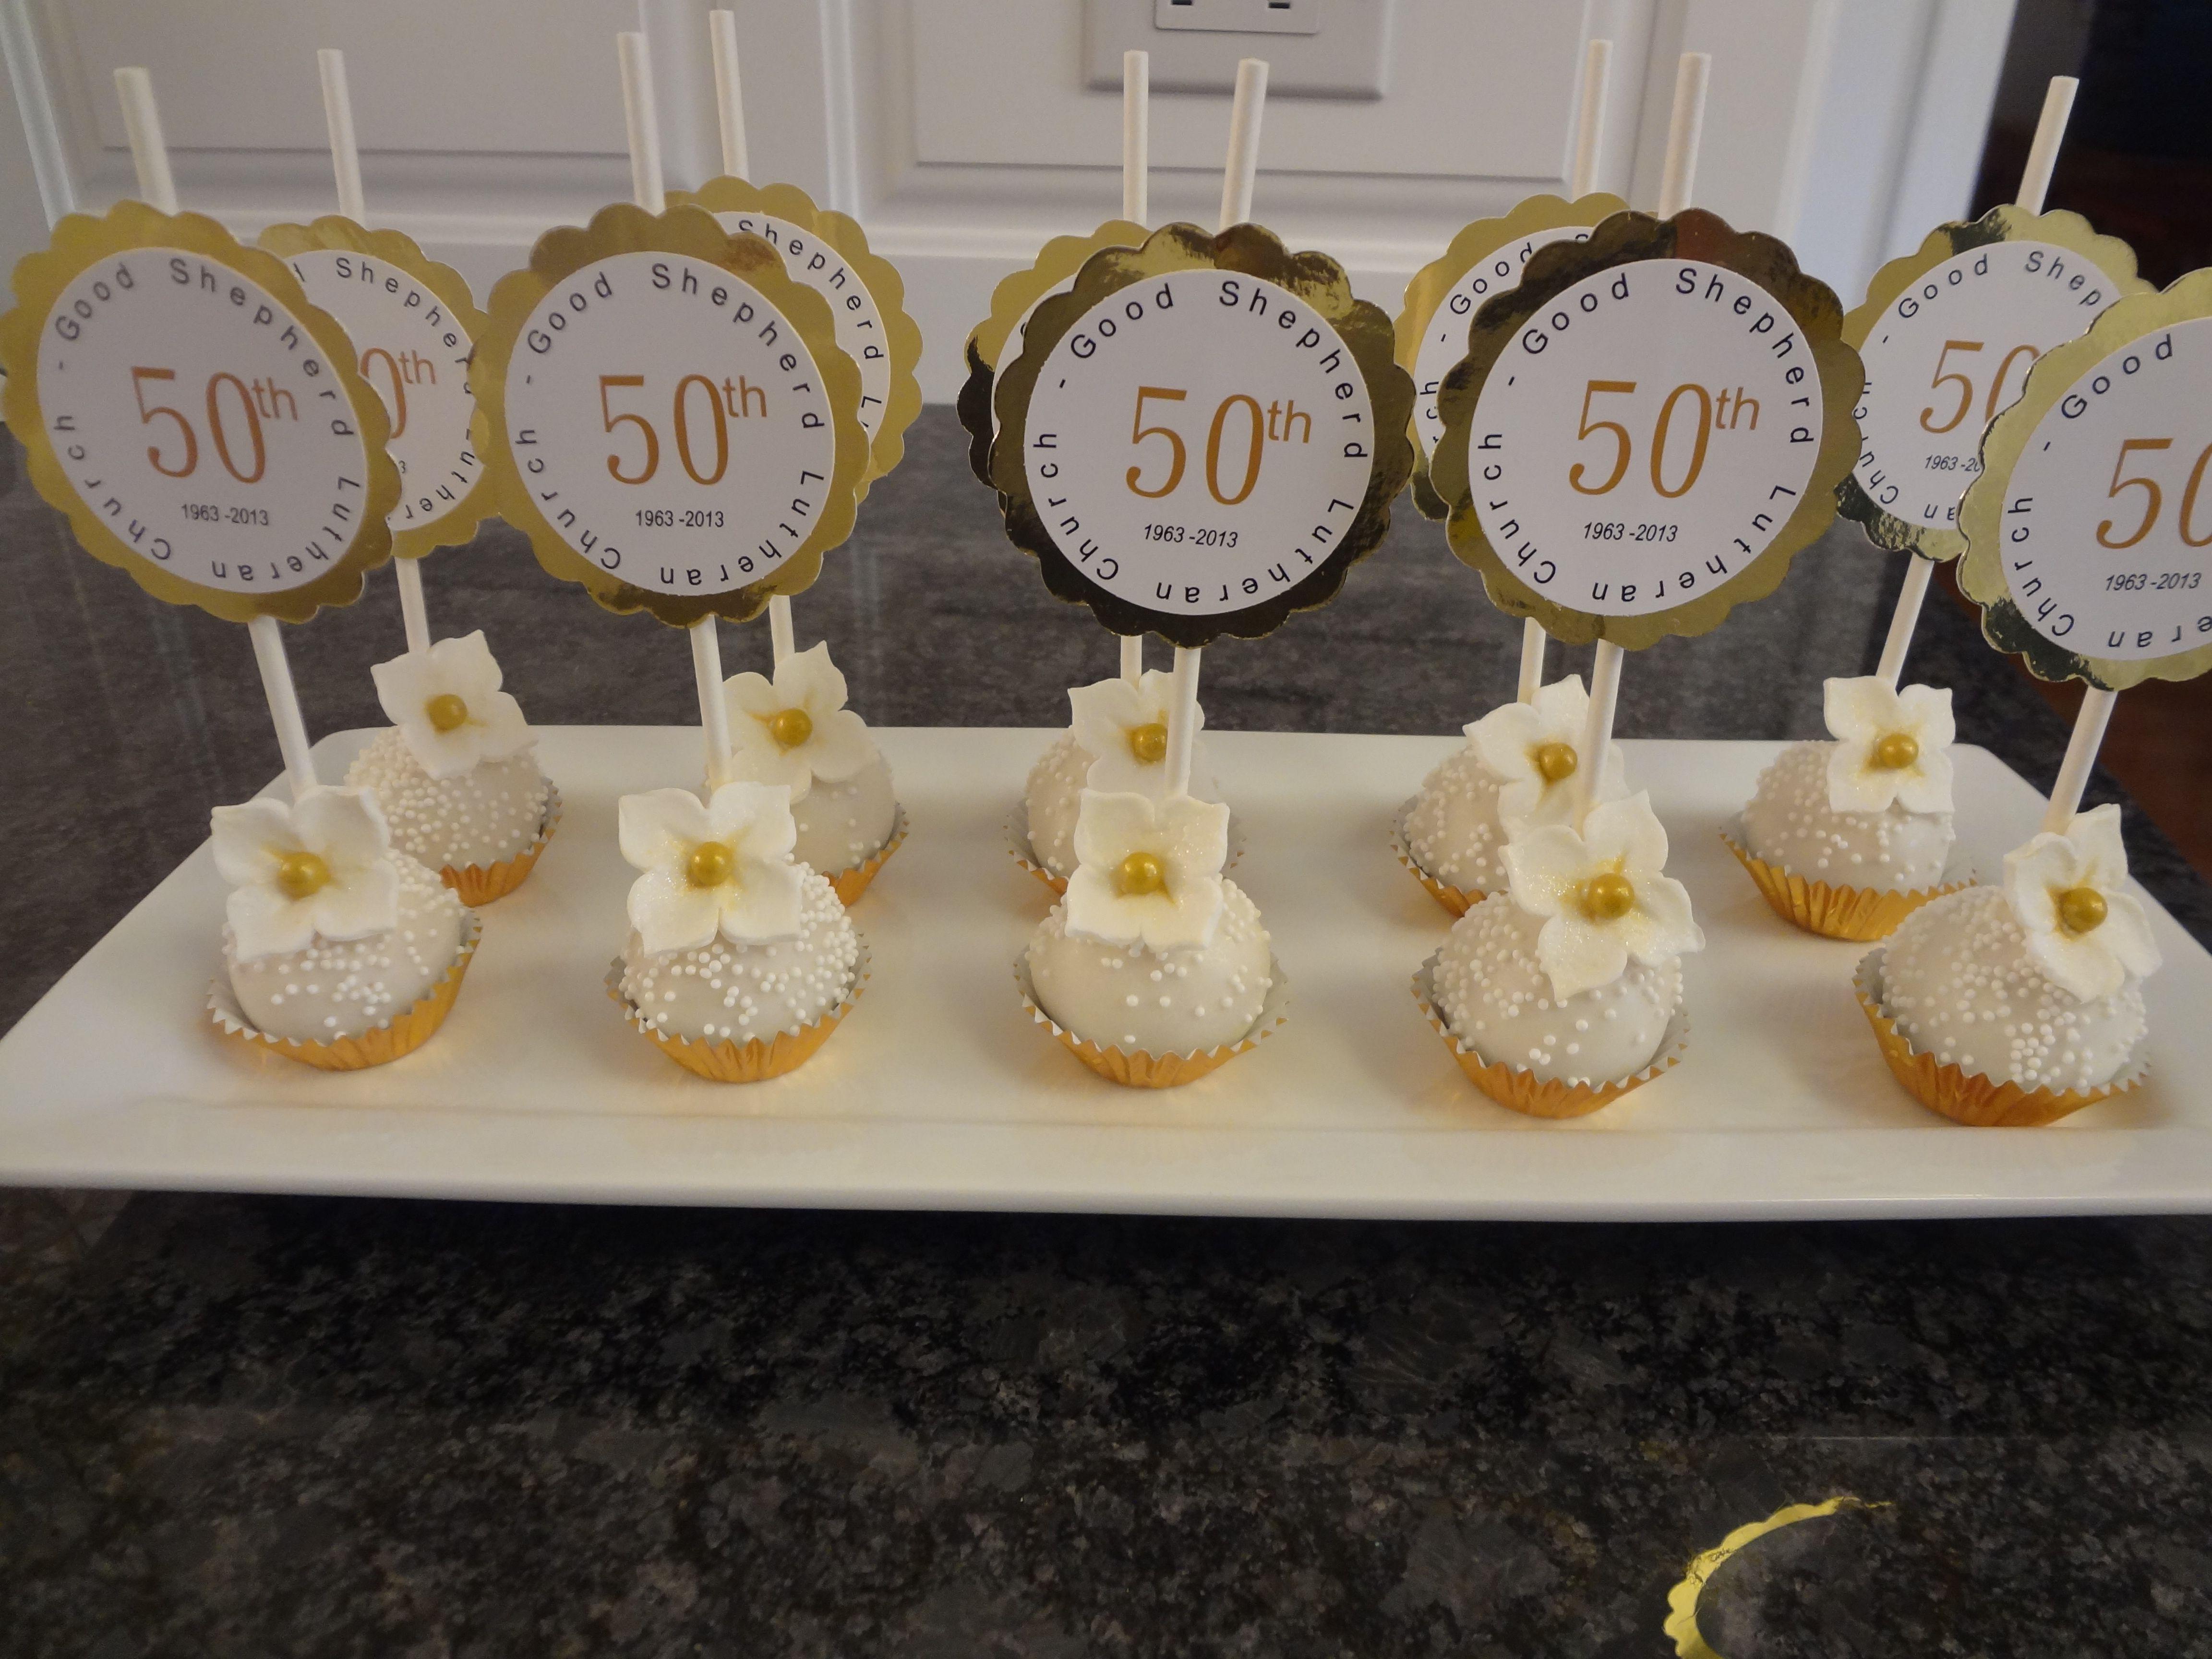 Sensational Cake Pops For 50Th Anniversary 50Th Anniversary Cakes 50Th Funny Birthday Cards Online Inifodamsfinfo